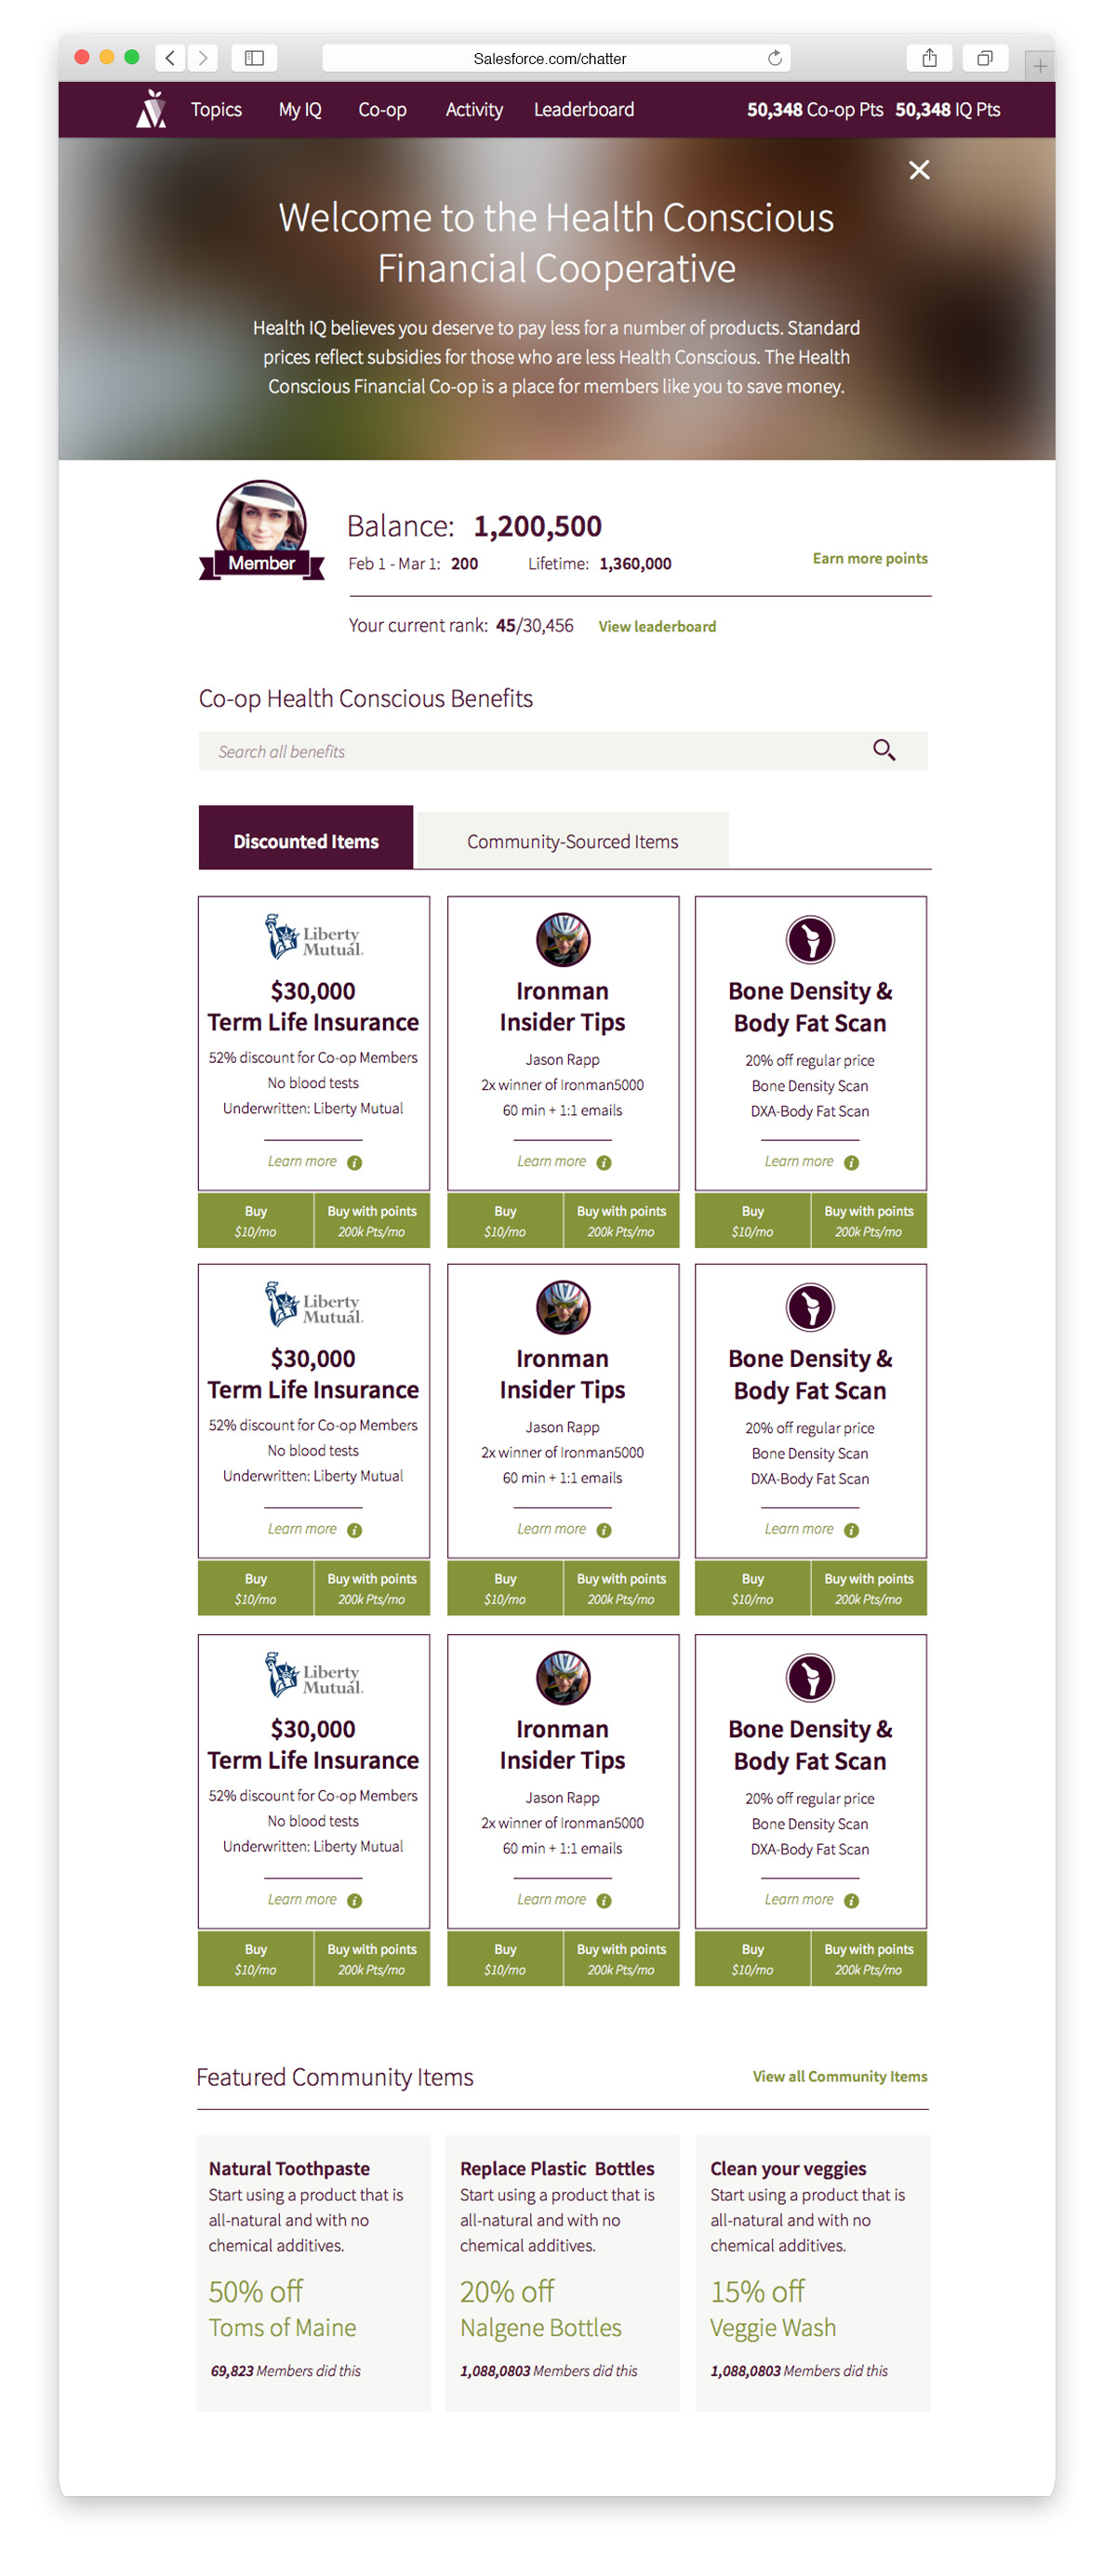 hiq-web-app-02.jpg